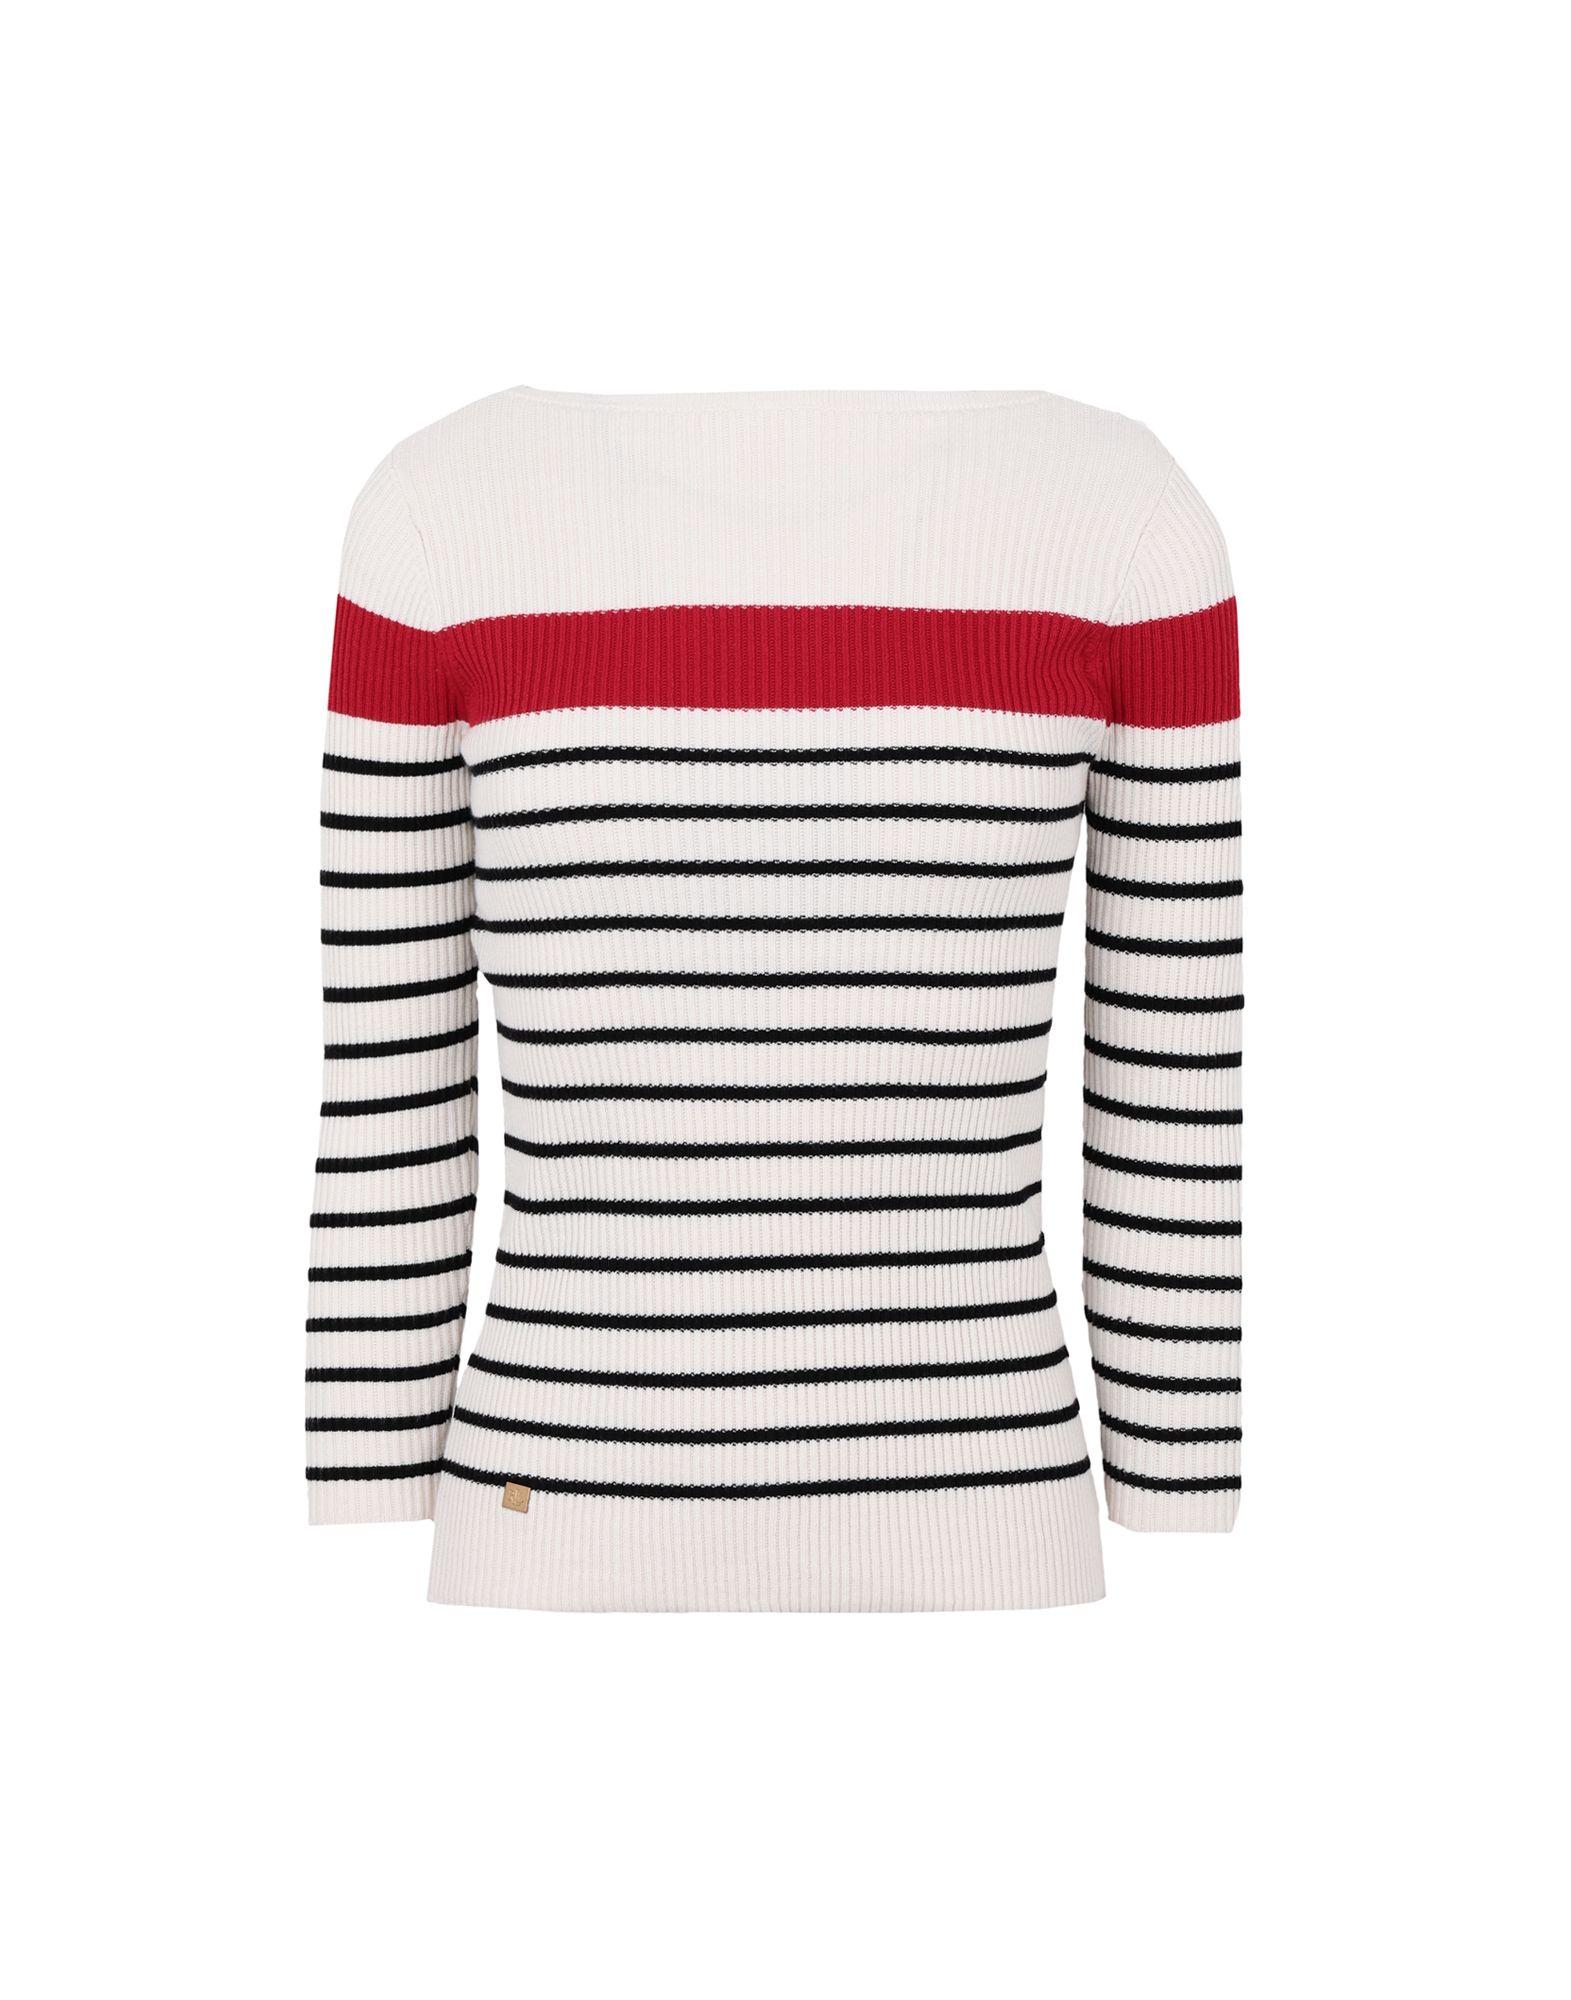 Cotton blend boatneck sweater pullover lauren...